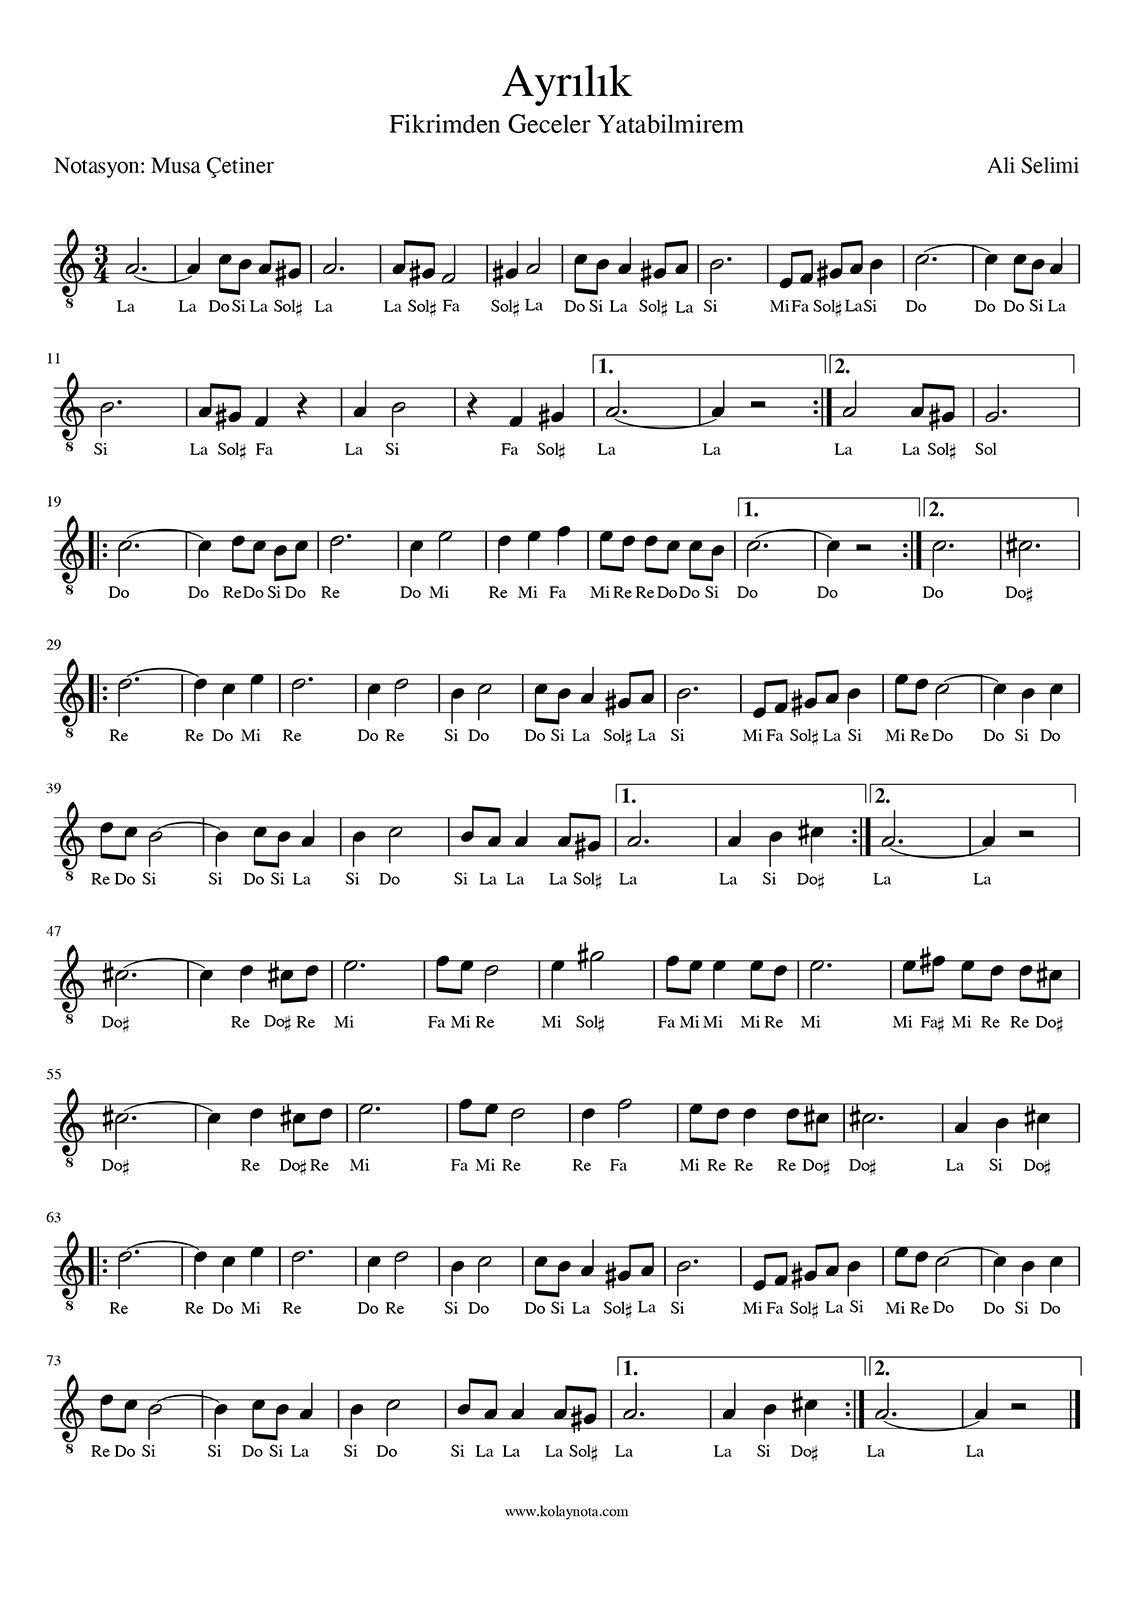 Ayrilik Fikrimden Geceler Kolay Nota Kolaynota Muzik Notalari Flut Notalara Dokulmus Muzik